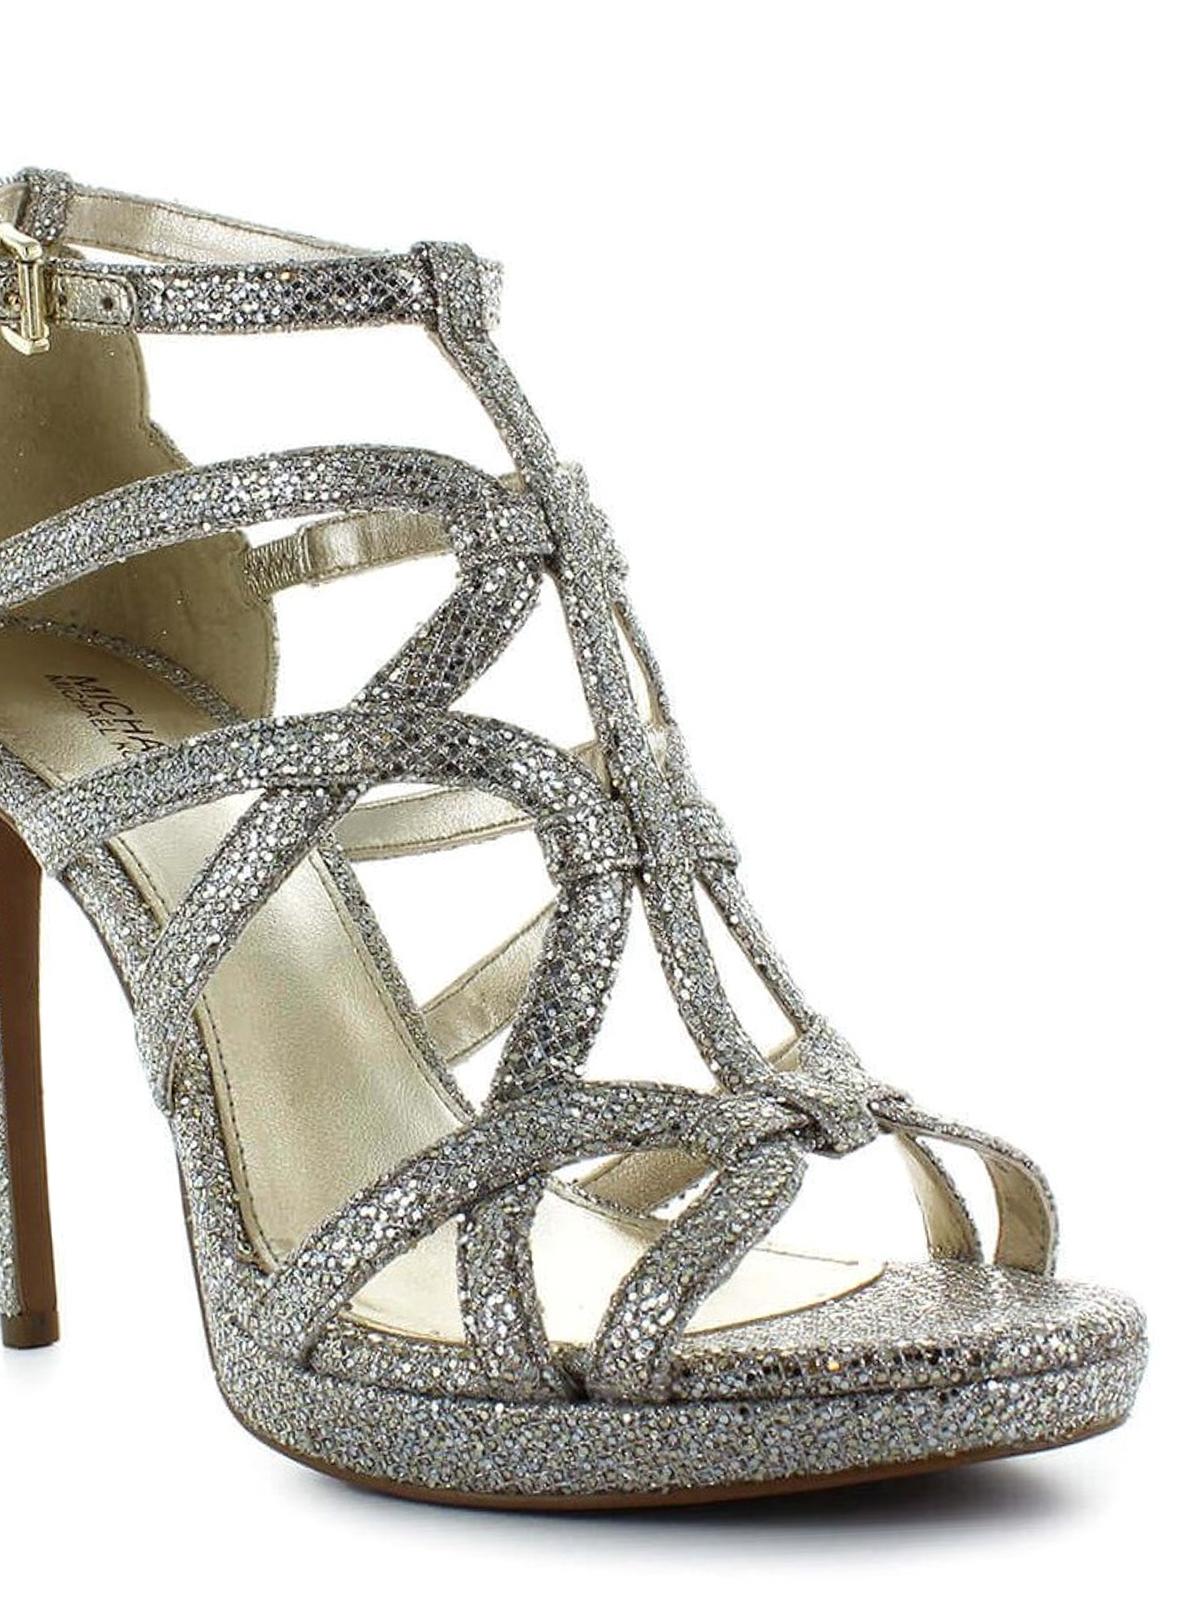 Michael Kors Sandra cage design glitter heeled sandals